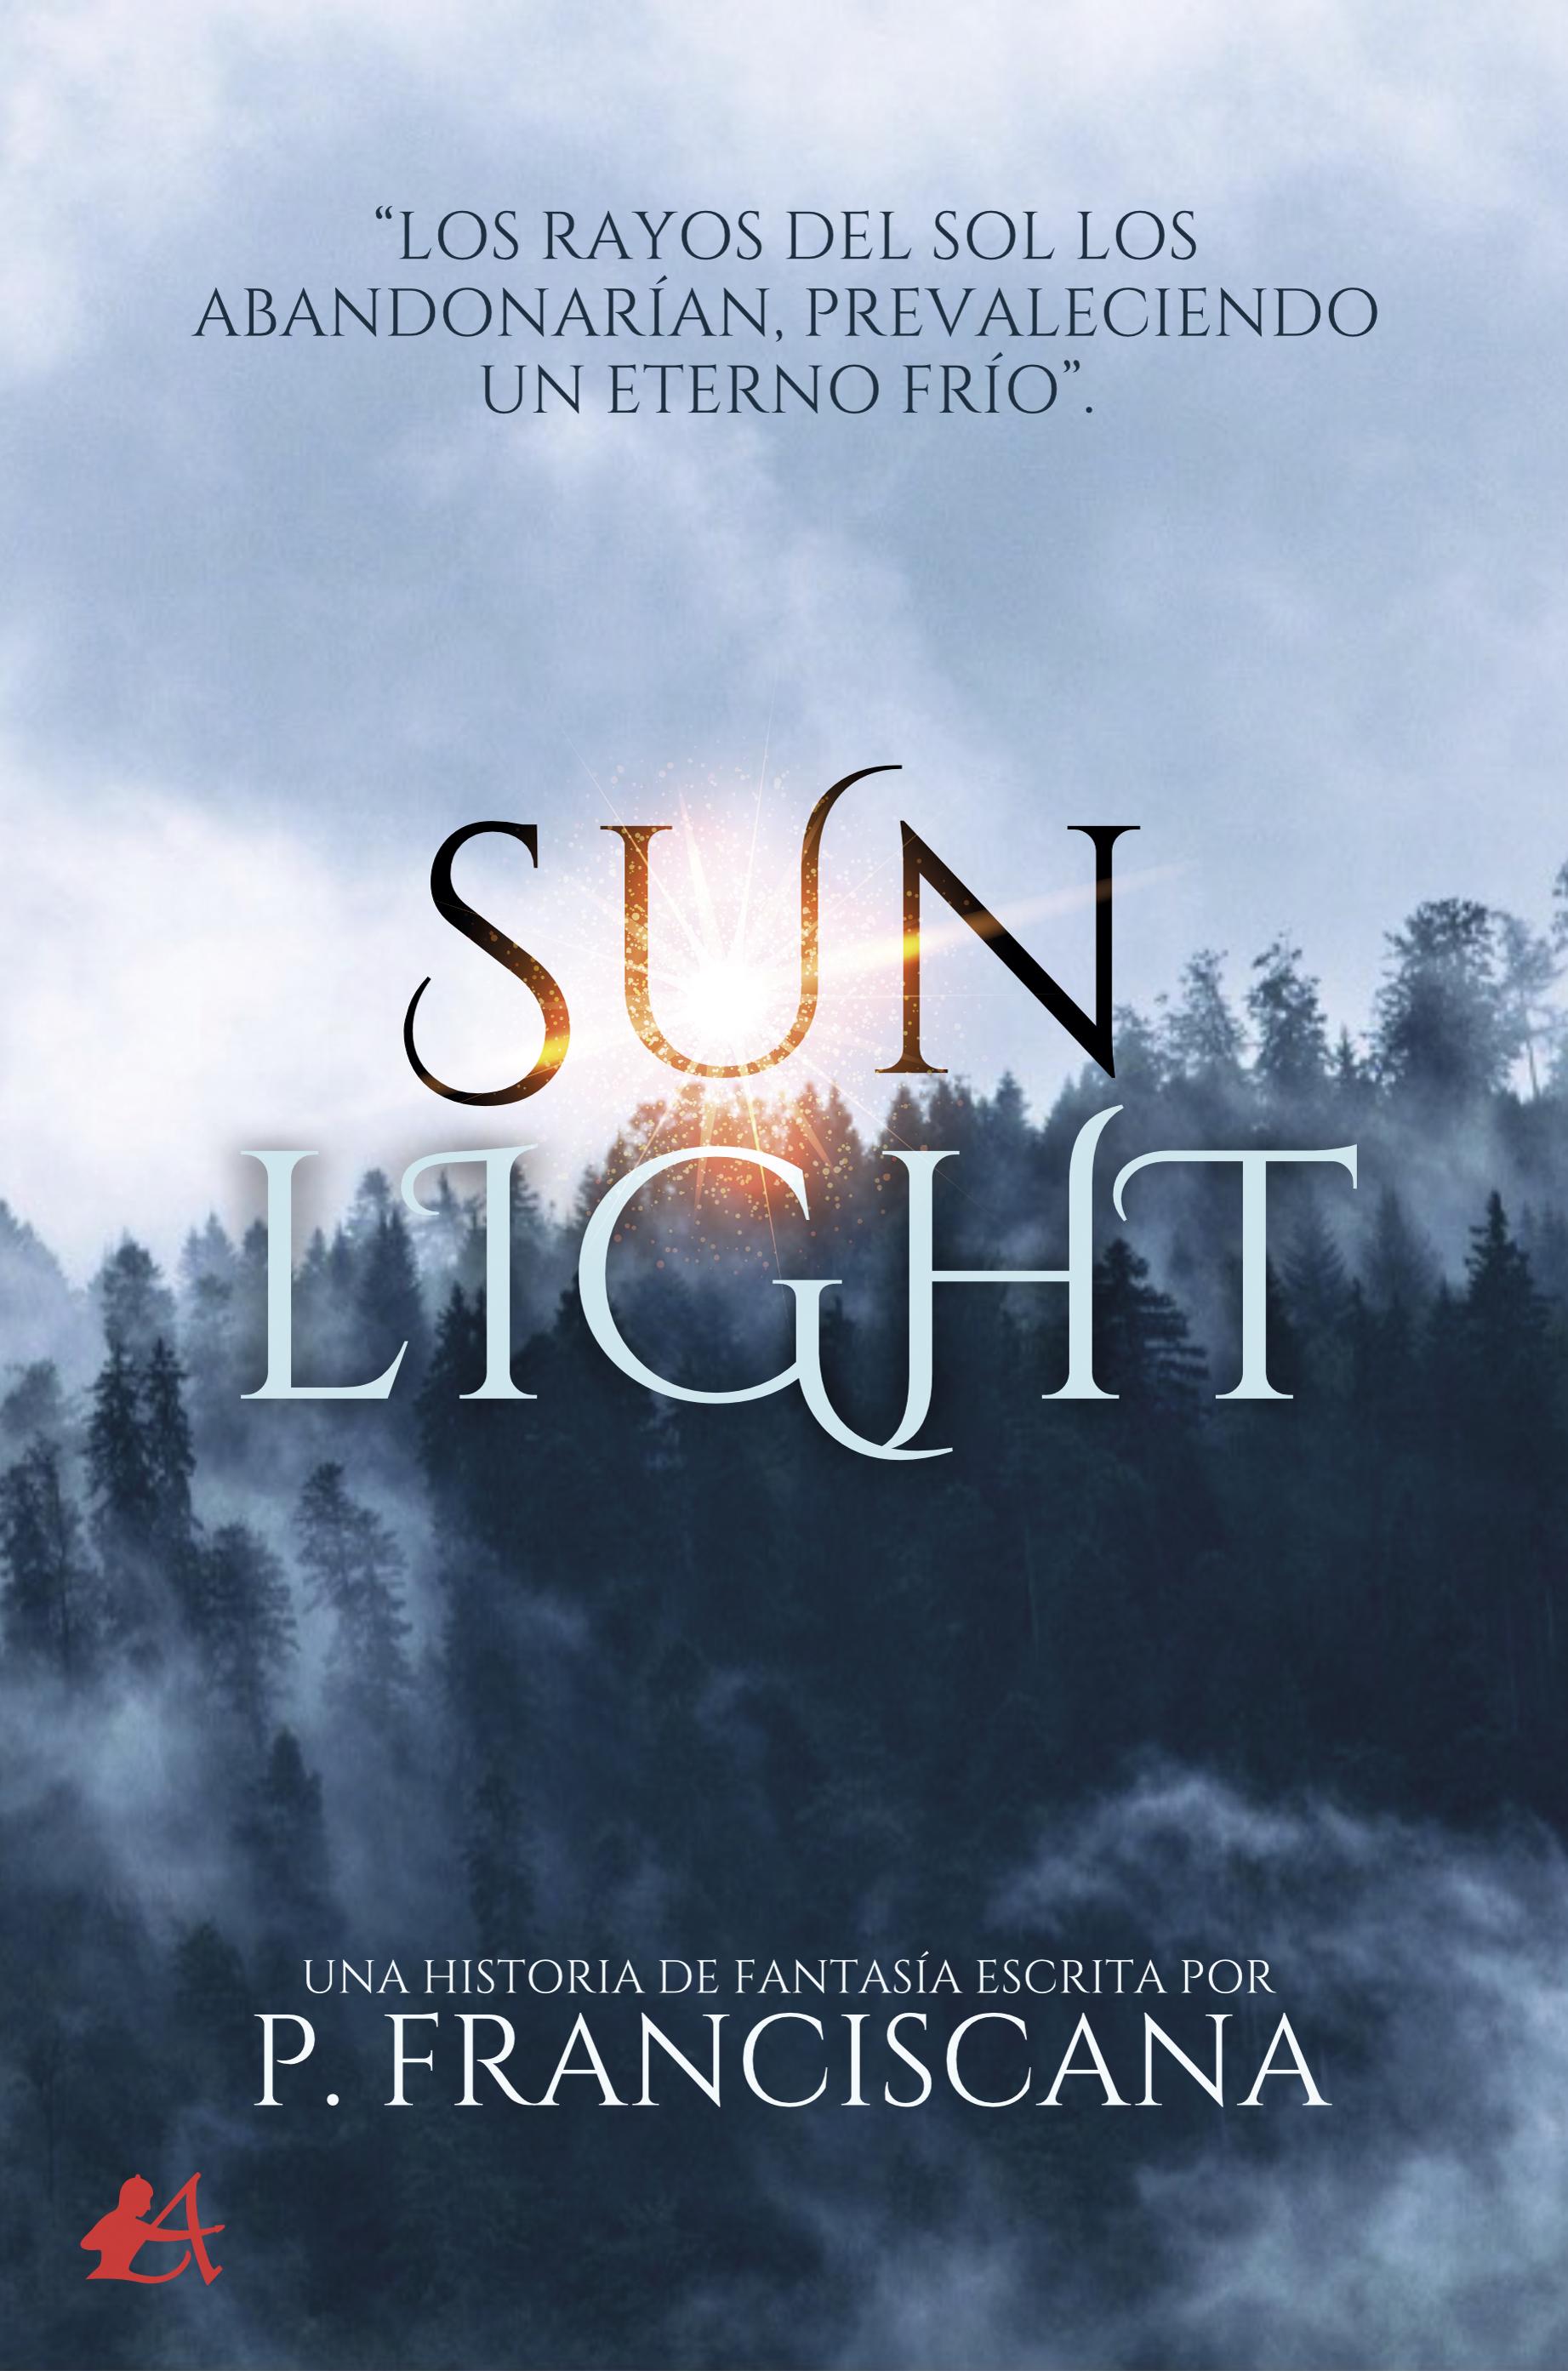 Portada del libro Sunlight de P Franciscana. Editorial Adarve, Publicar un libro